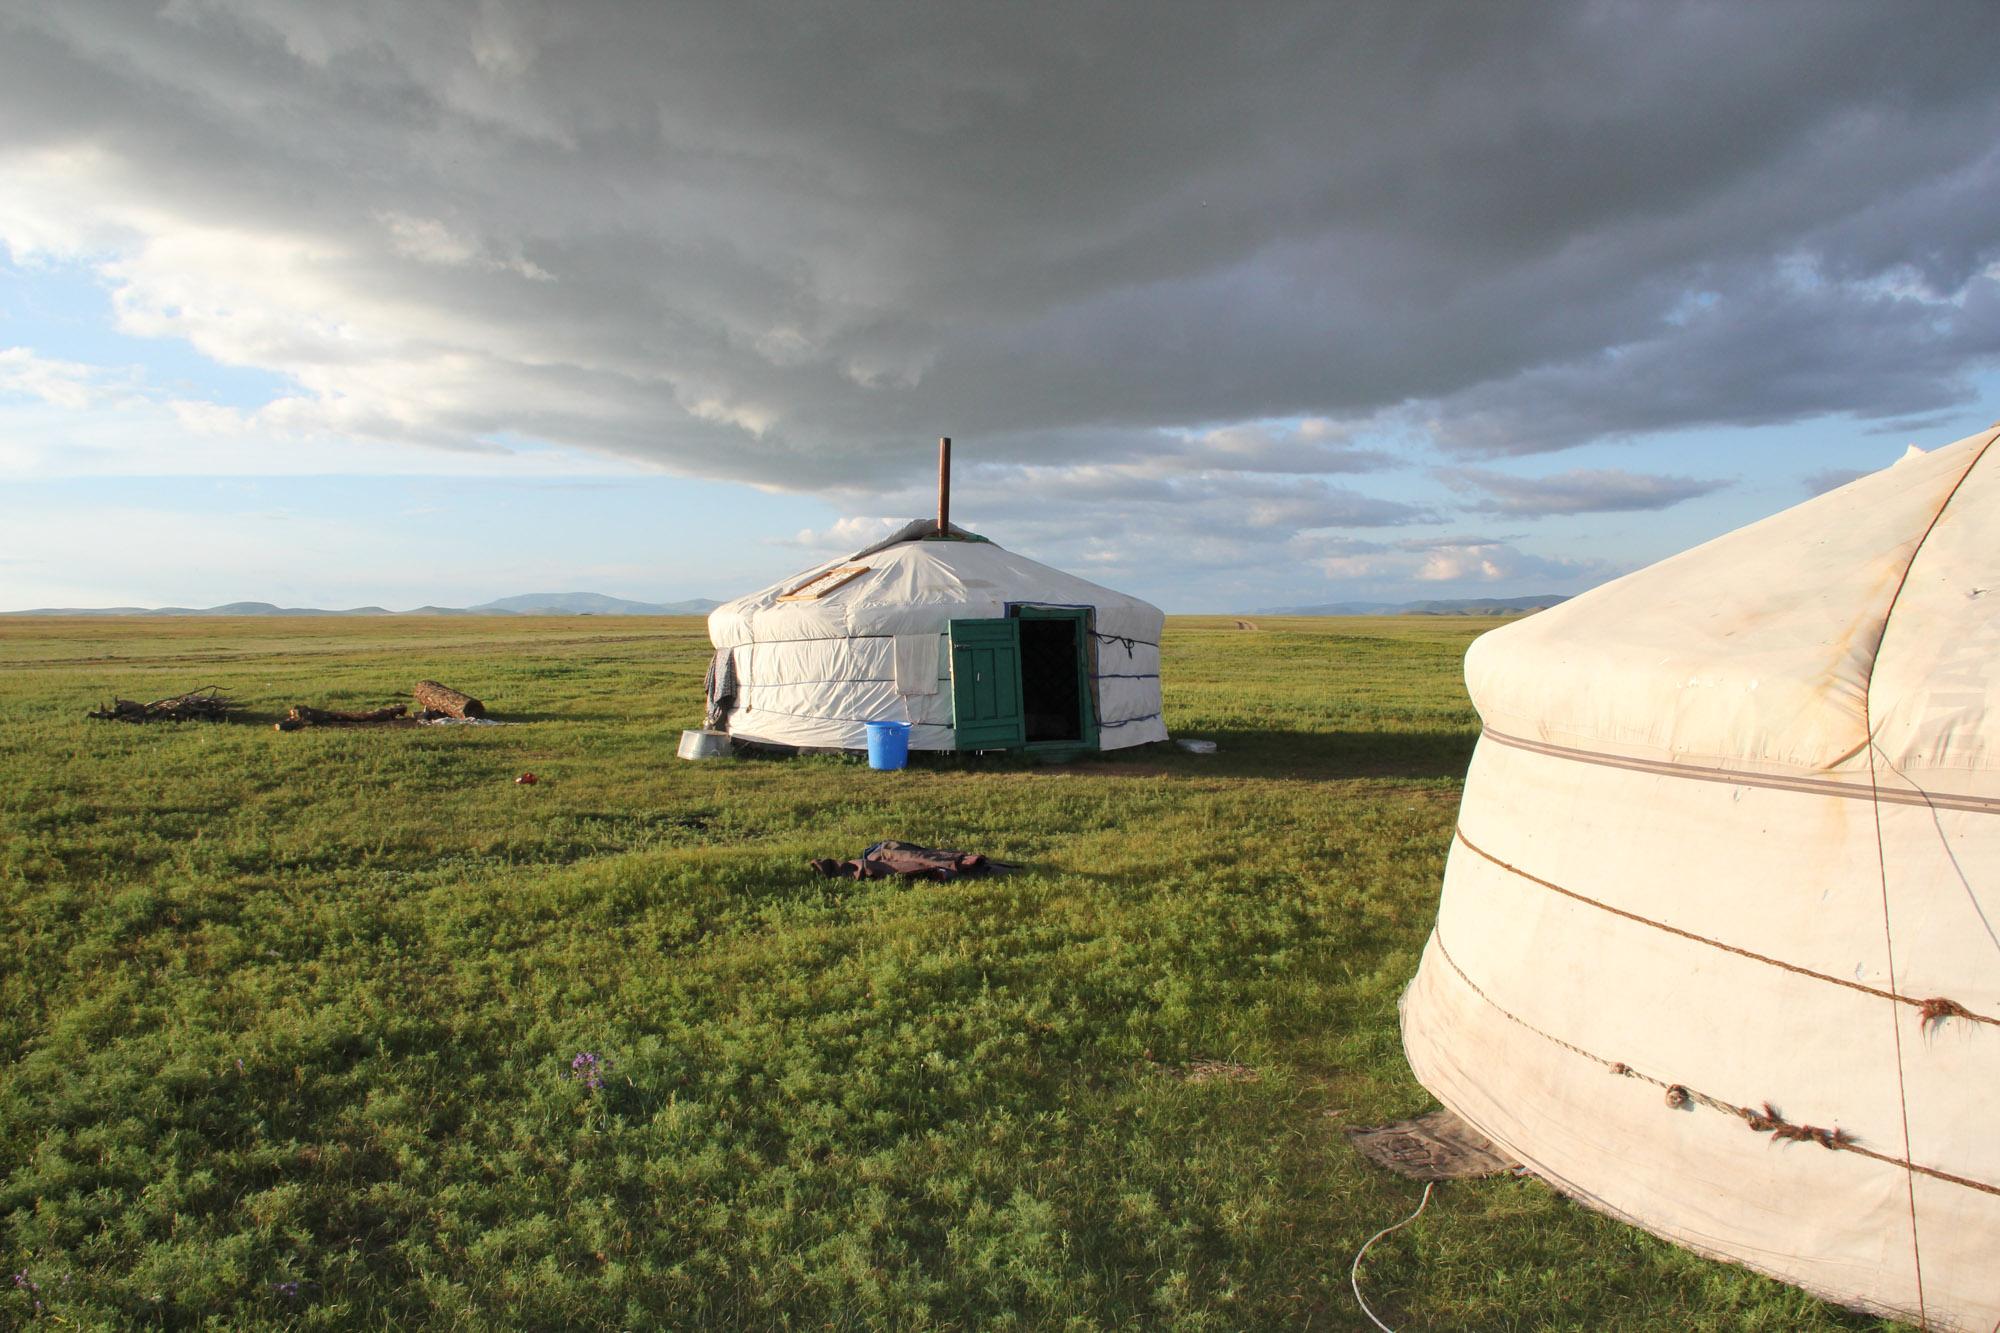 Ecotourisme-voyages-alternatifs-Mongolie-Immersion-9.jpg